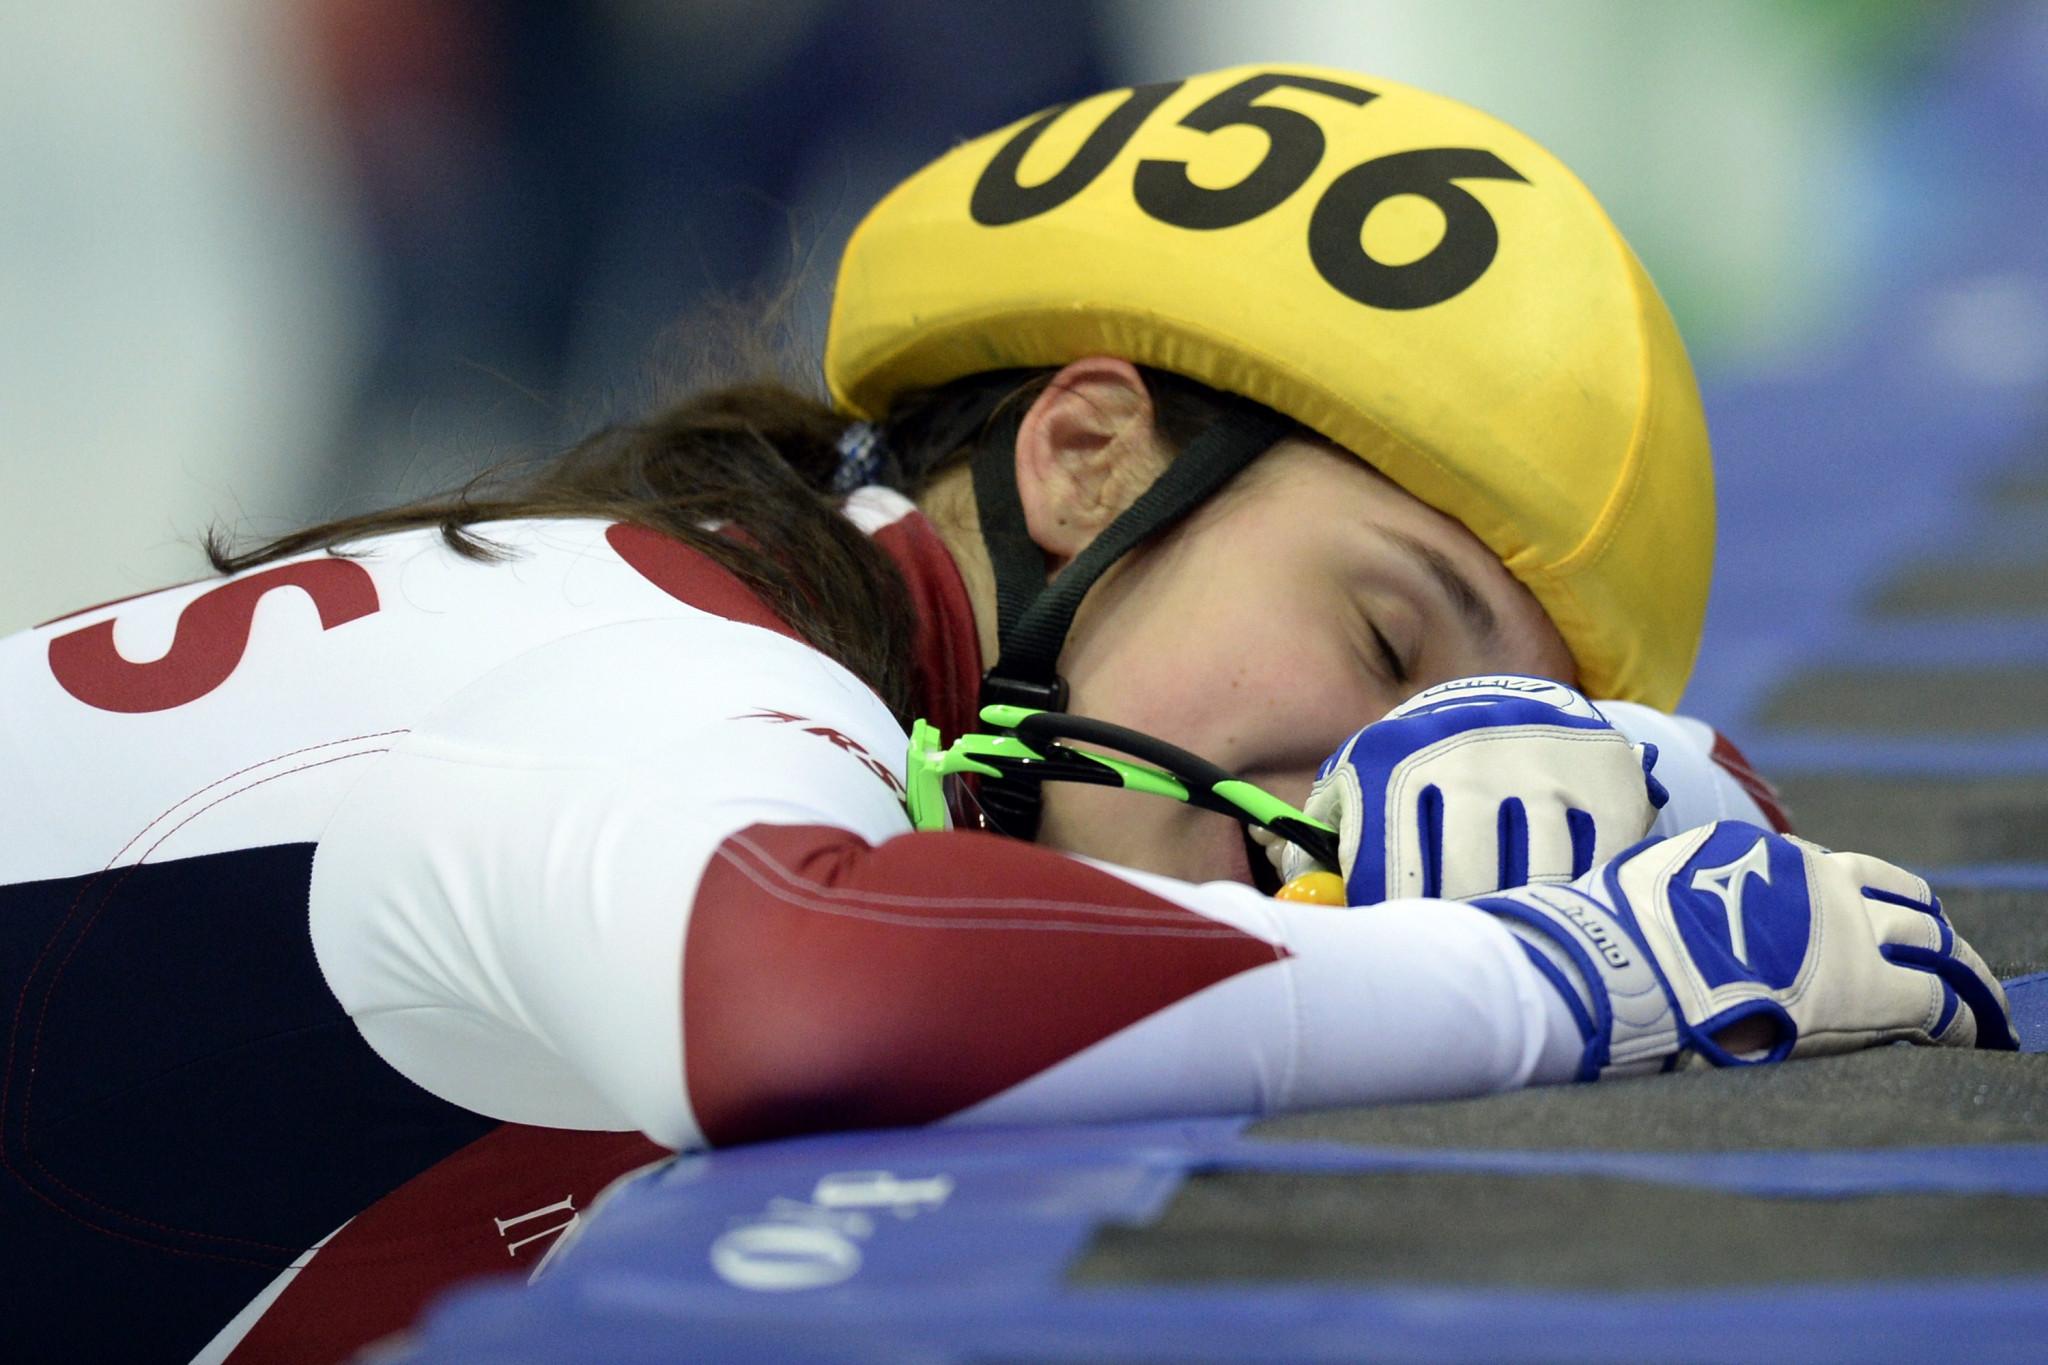 Prosvirnova among qualifiers as European Short Track Championships begin in Dresden